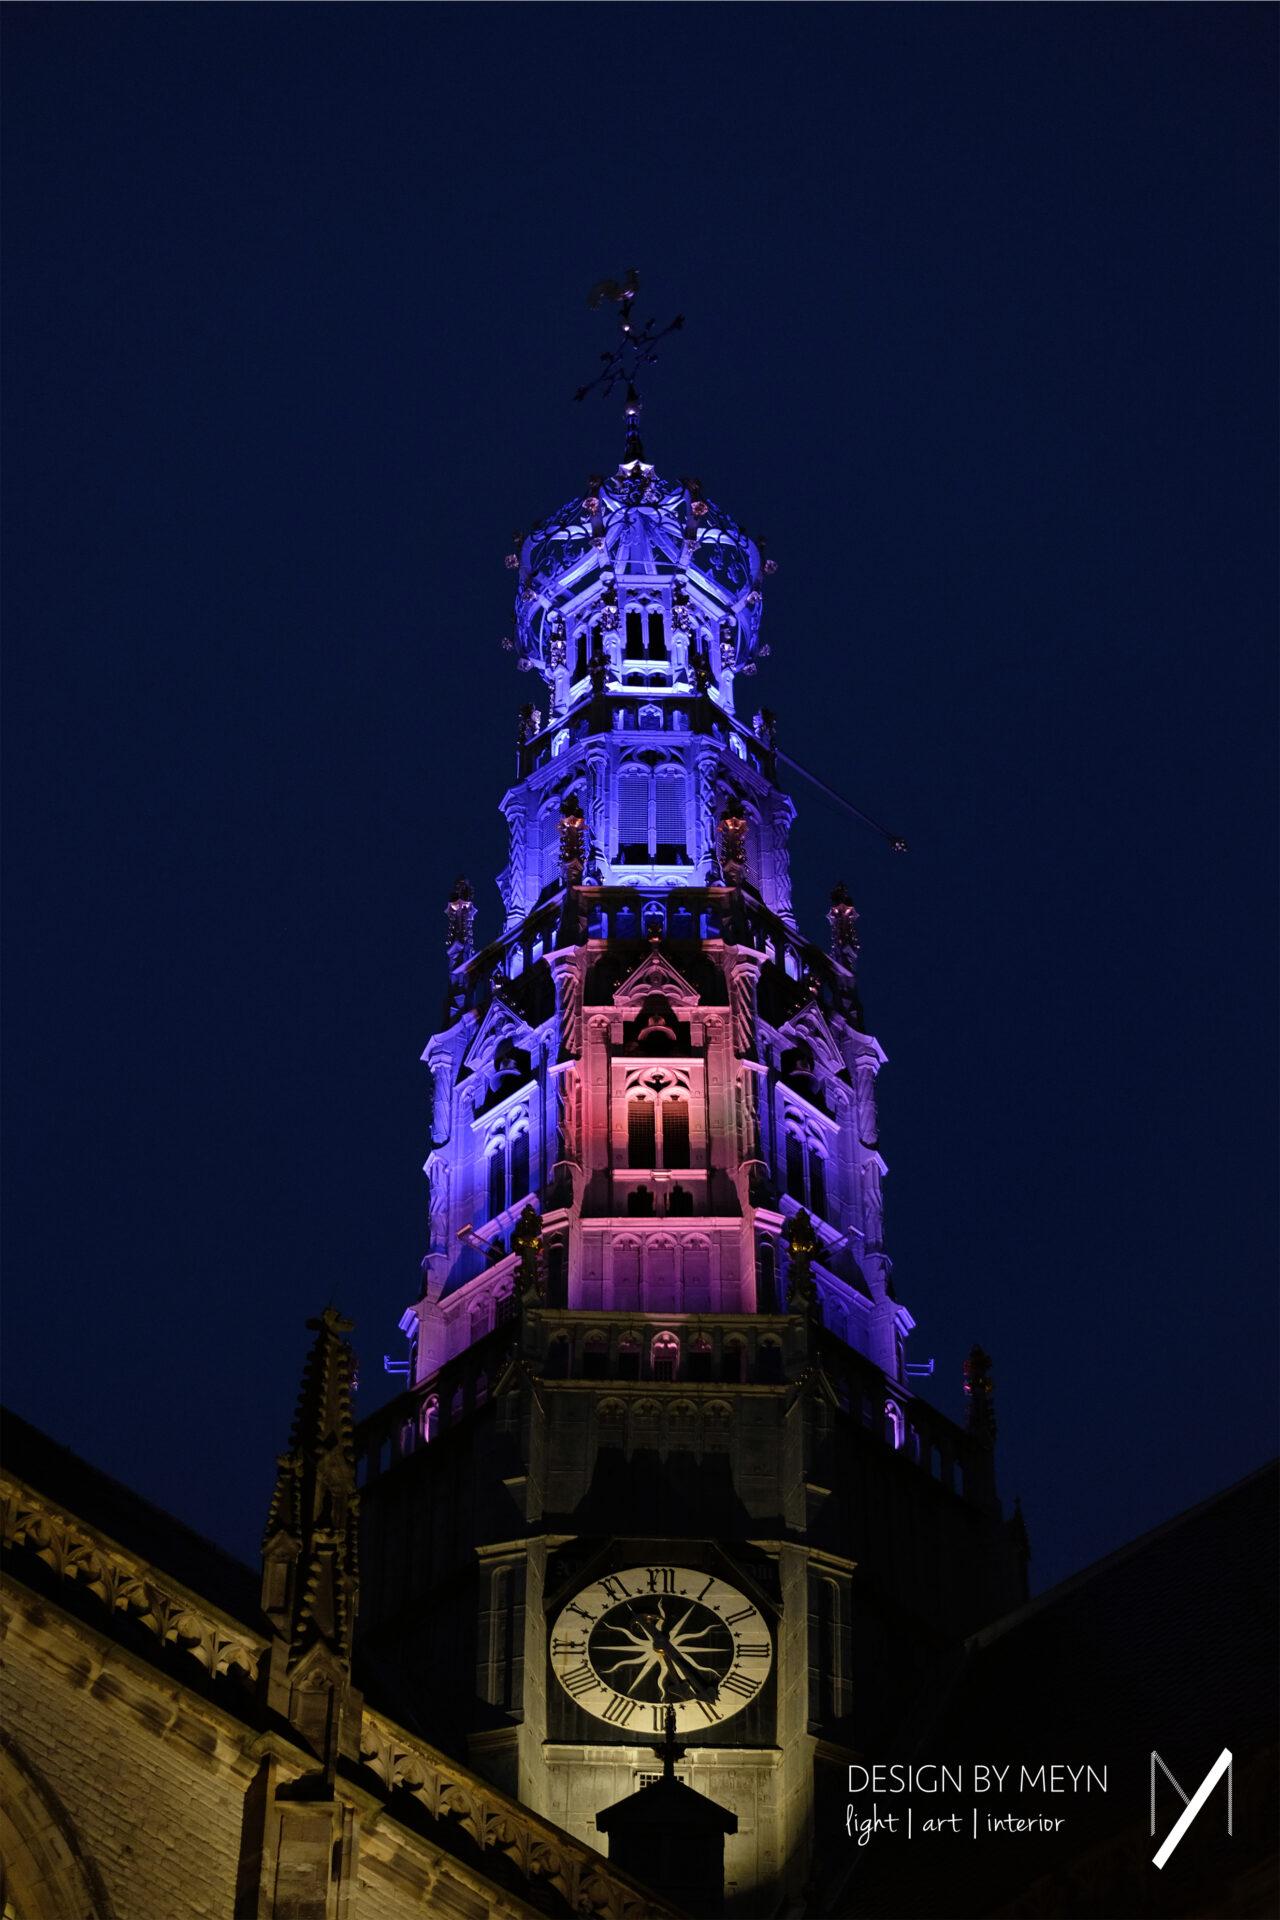 lichtkunst toren Grote of St.-Bavo Kerk Haarlem, seizoen lente